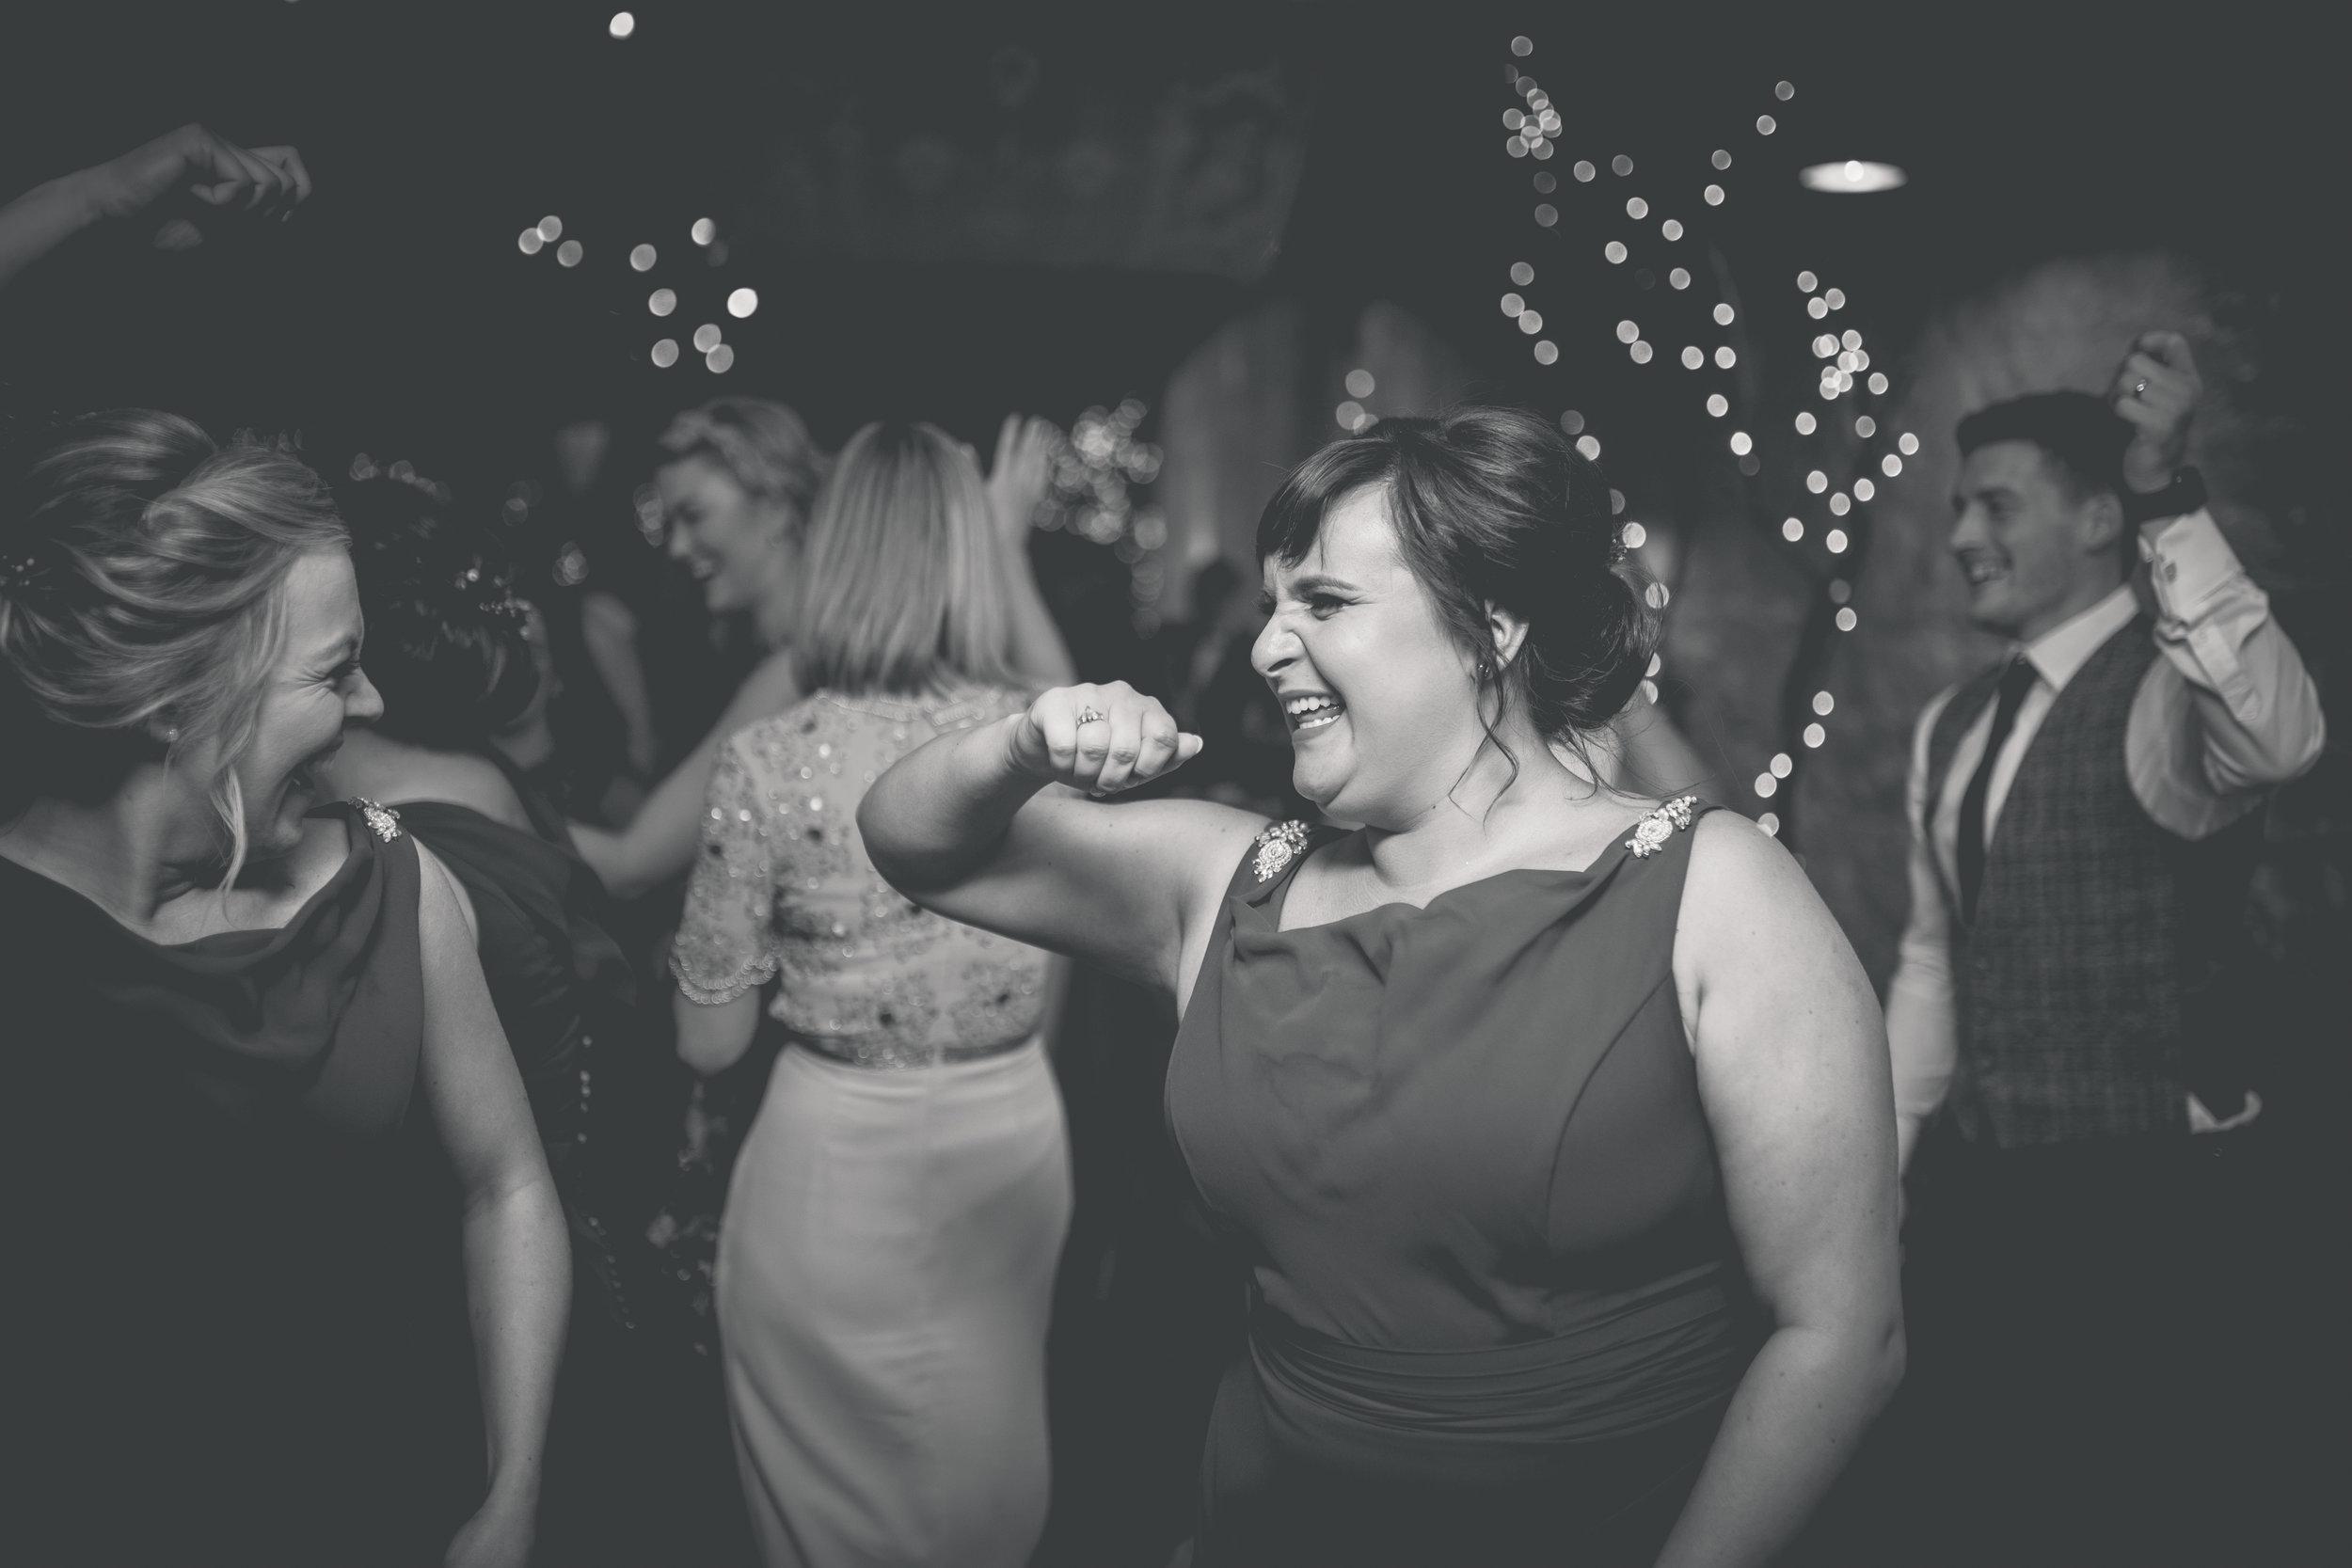 Brian McEwan Wedding Photography | Carol-Annee & Sean | The Dancing-62.jpg